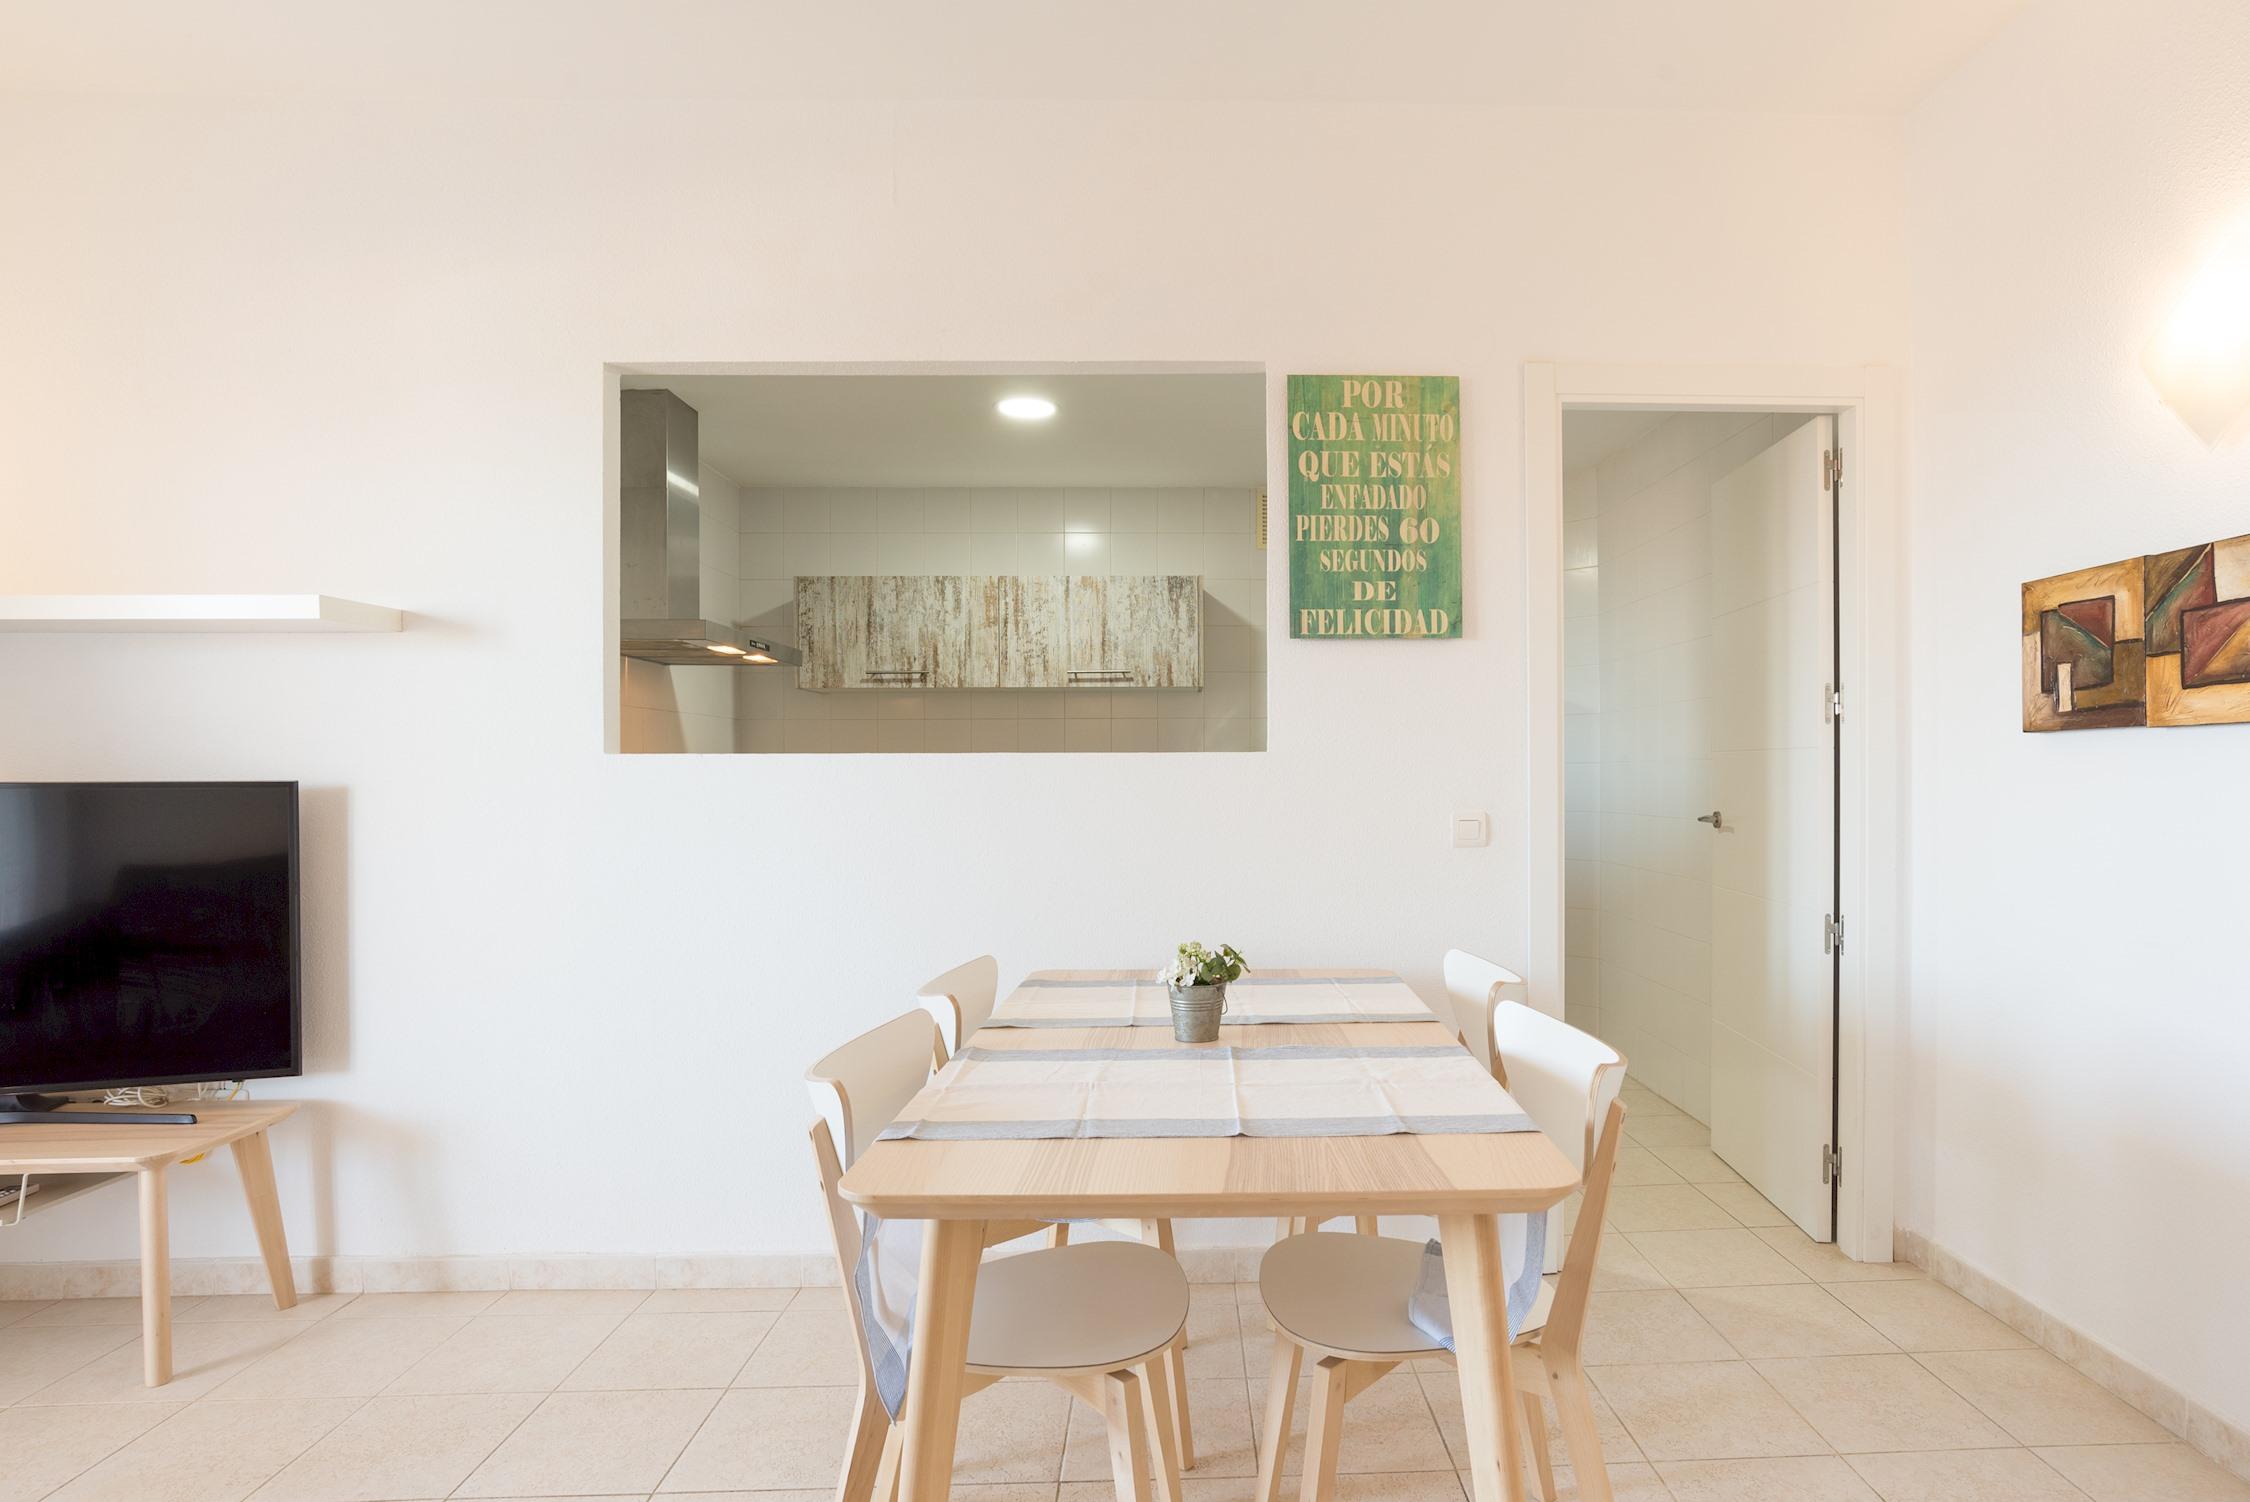 Apartment MalagaSuite Higueron Beach Pool photo 21808418